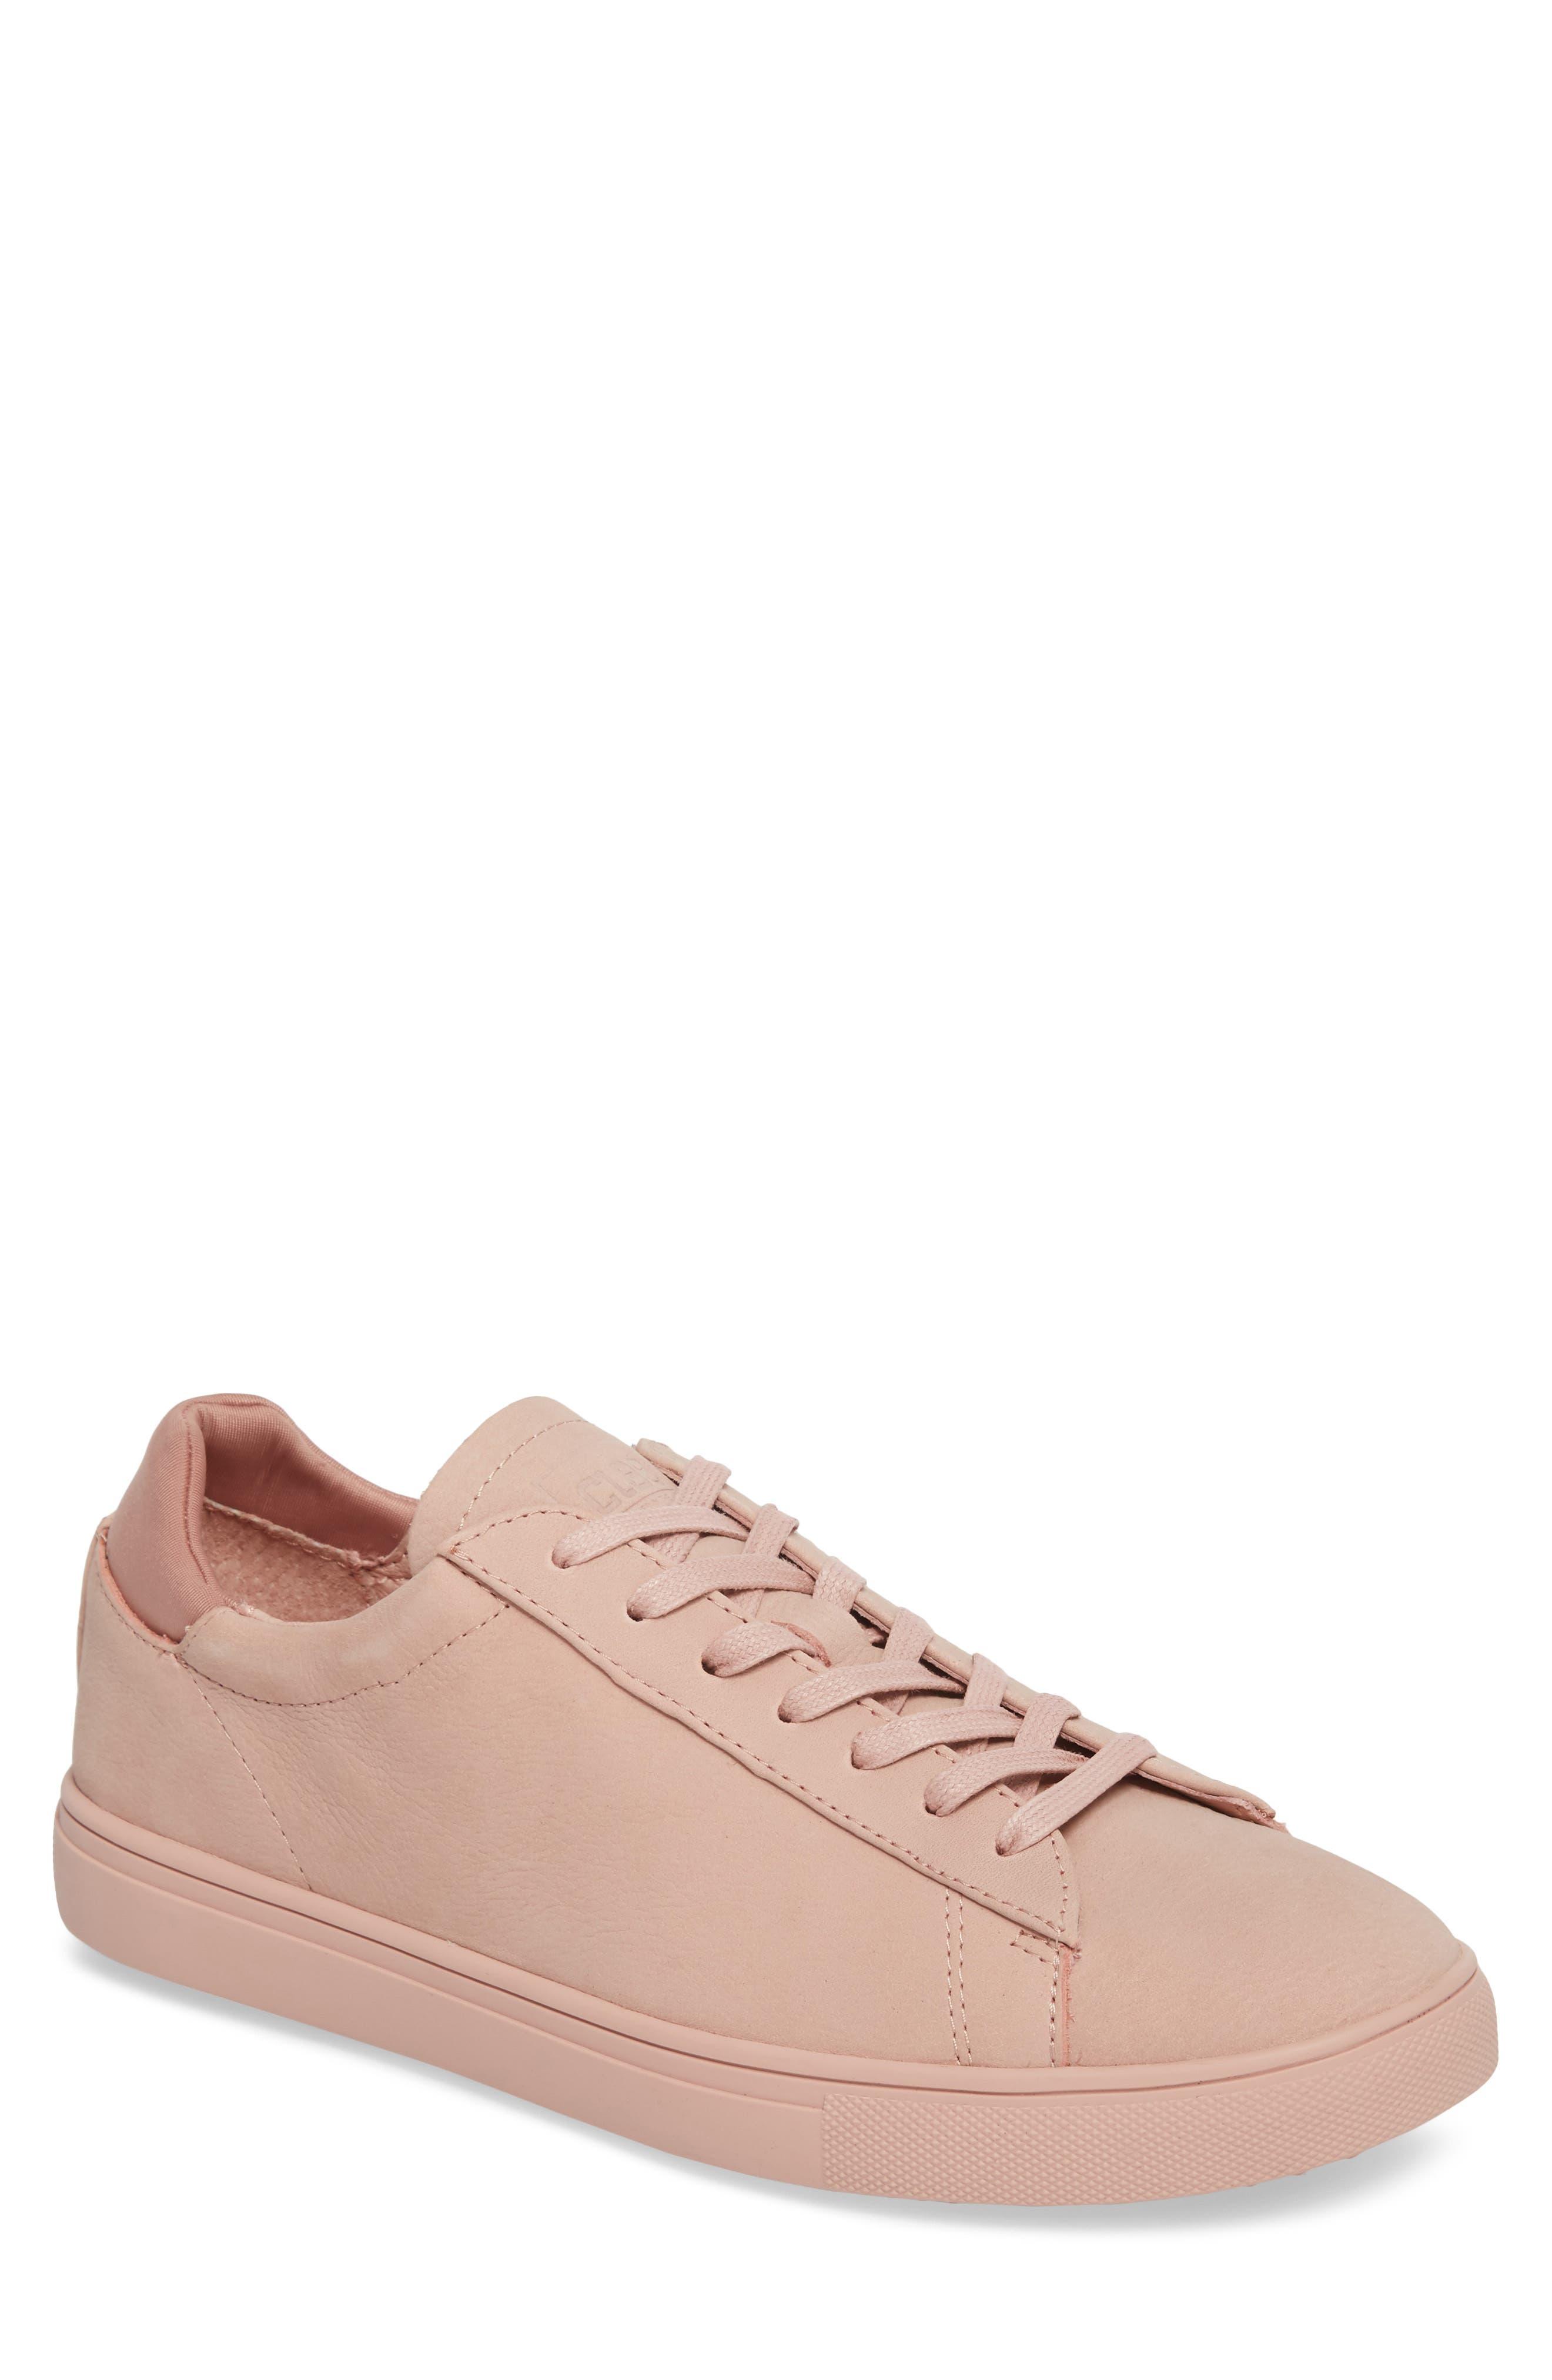 'Bradley' Sneaker,                         Main,                         color, ROSE NUBUCK